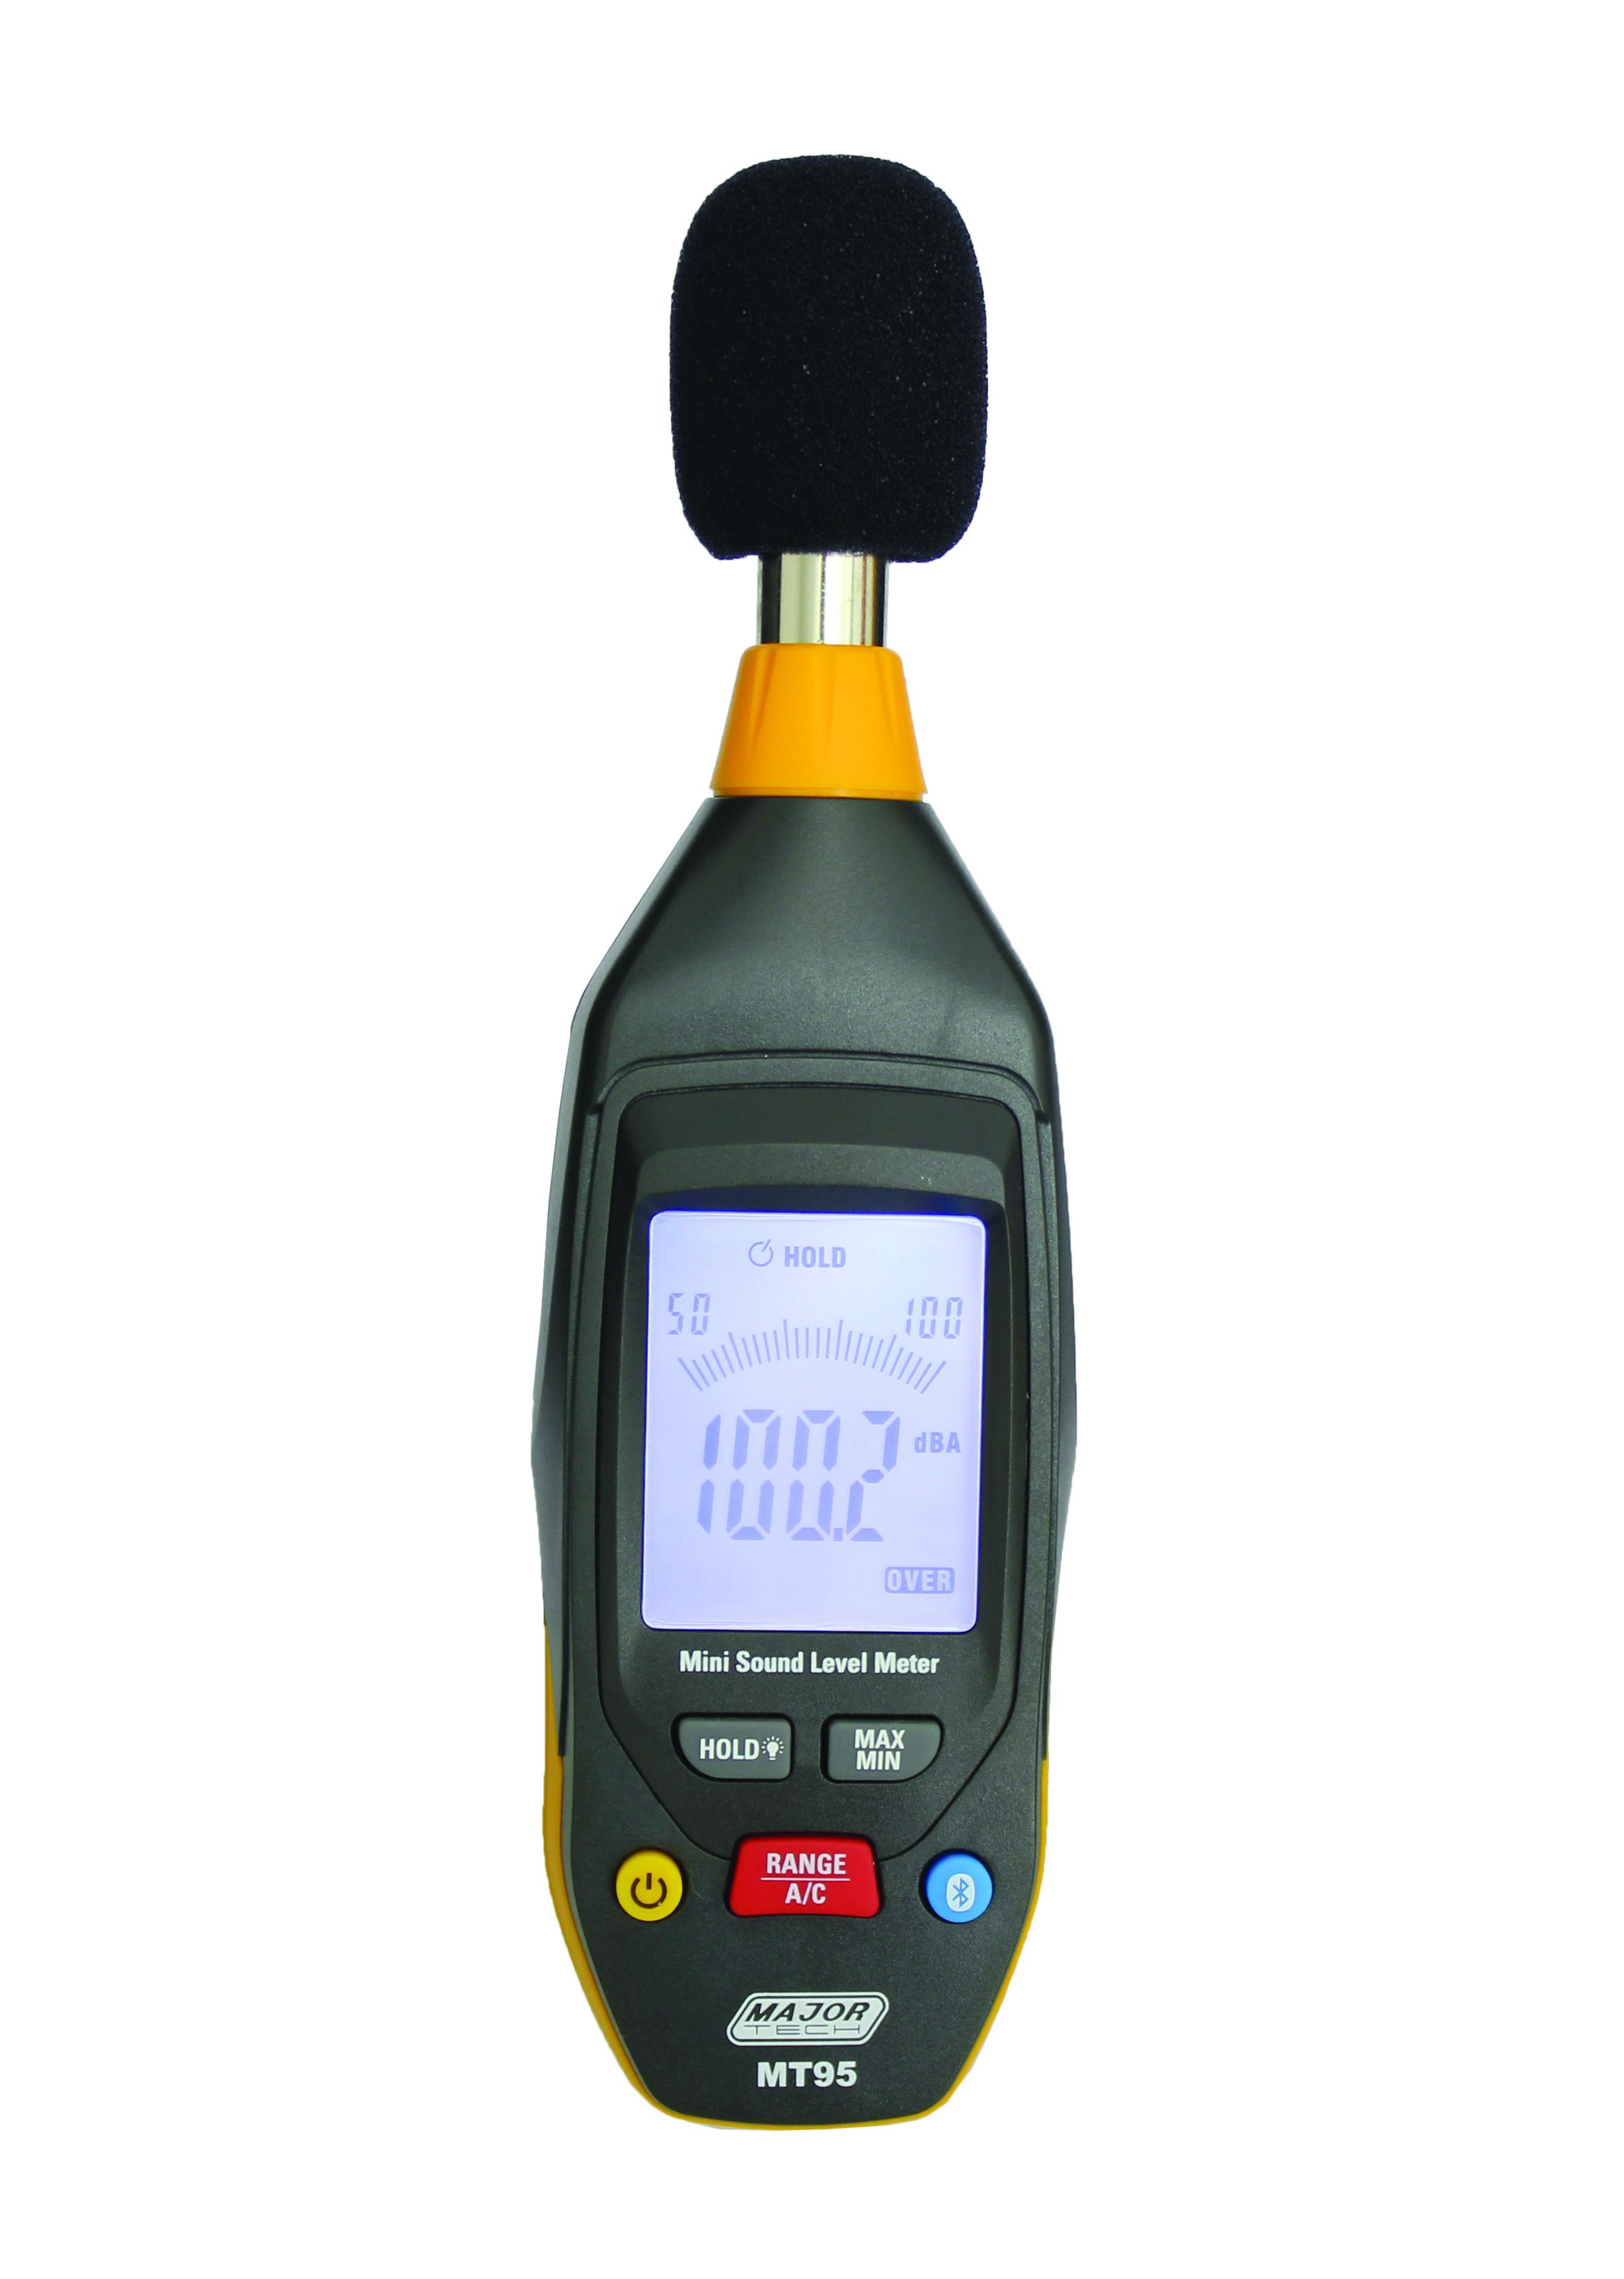 Digital Mini Sound Level Meter (MT95) - Major Tech